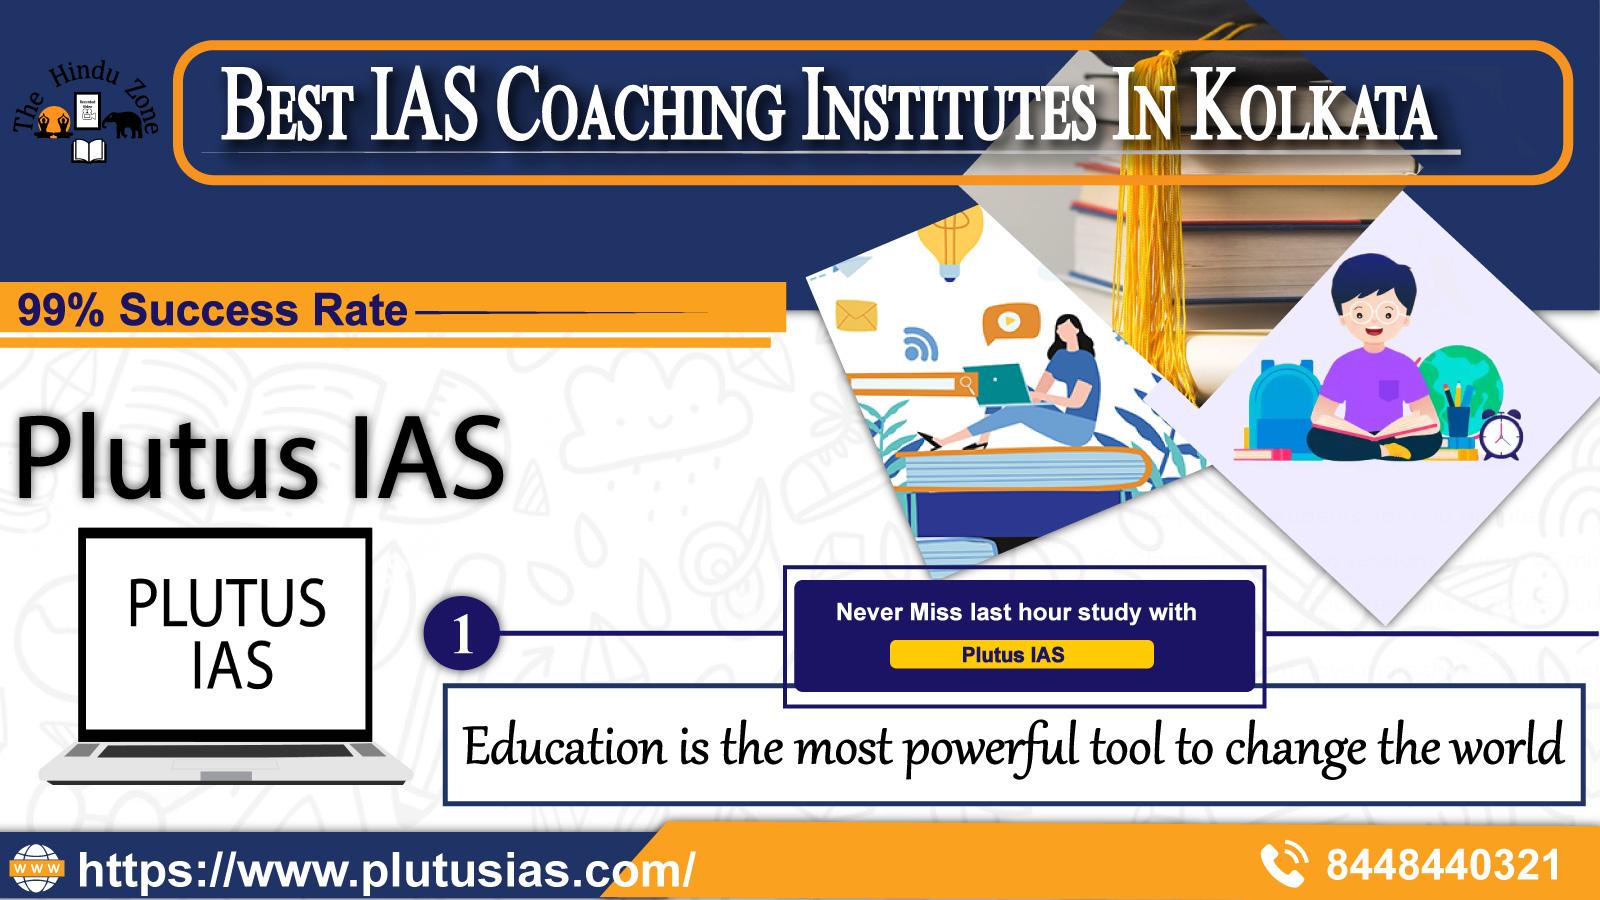 Plutus ias coaching in kolkata